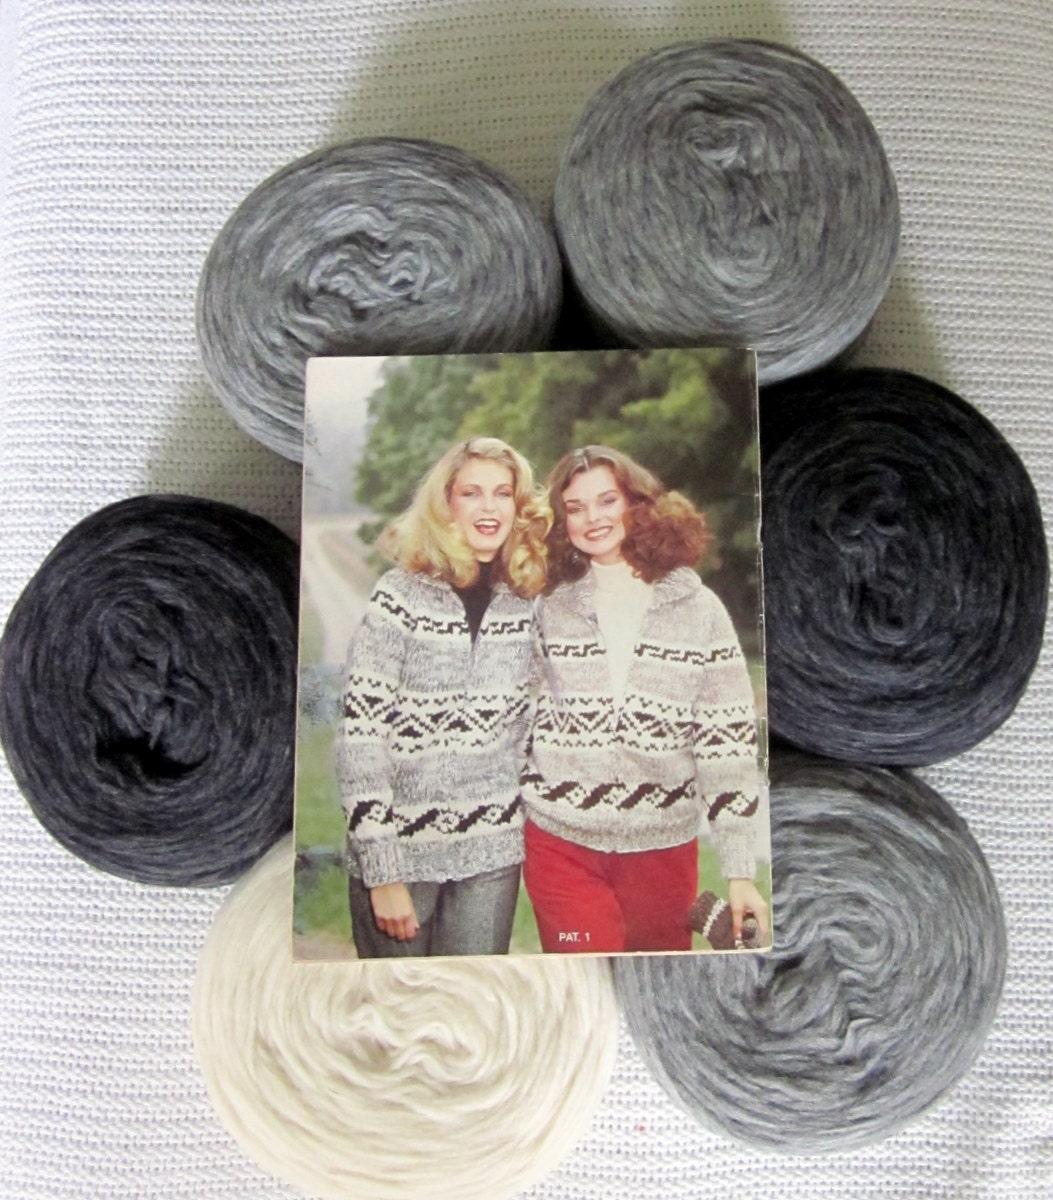 Beginner Knitting Kits Canada : Knitting kit cowichan sweater geometric pattern canadian